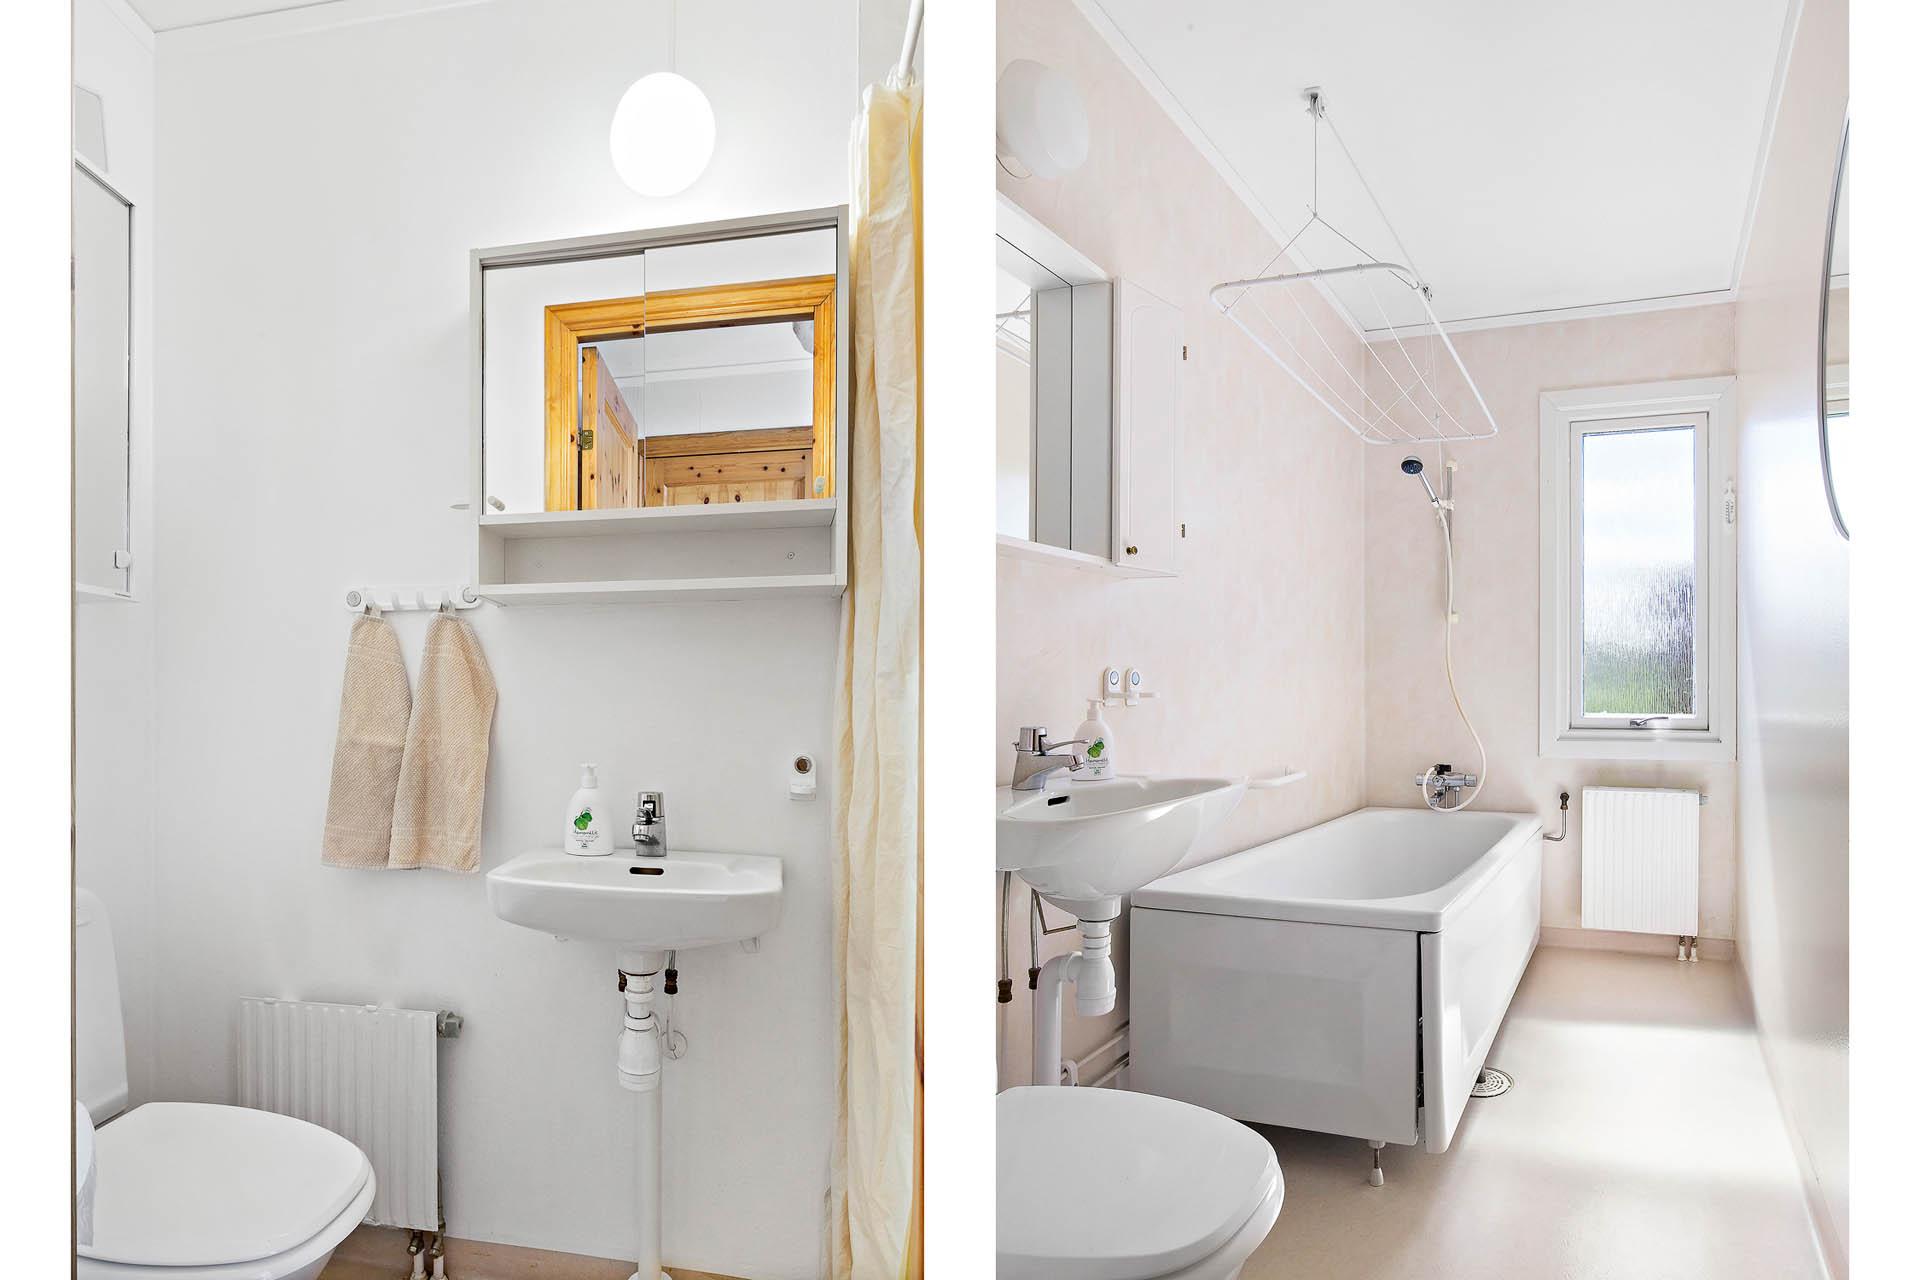 Badrum dusch samt badrum med badkar